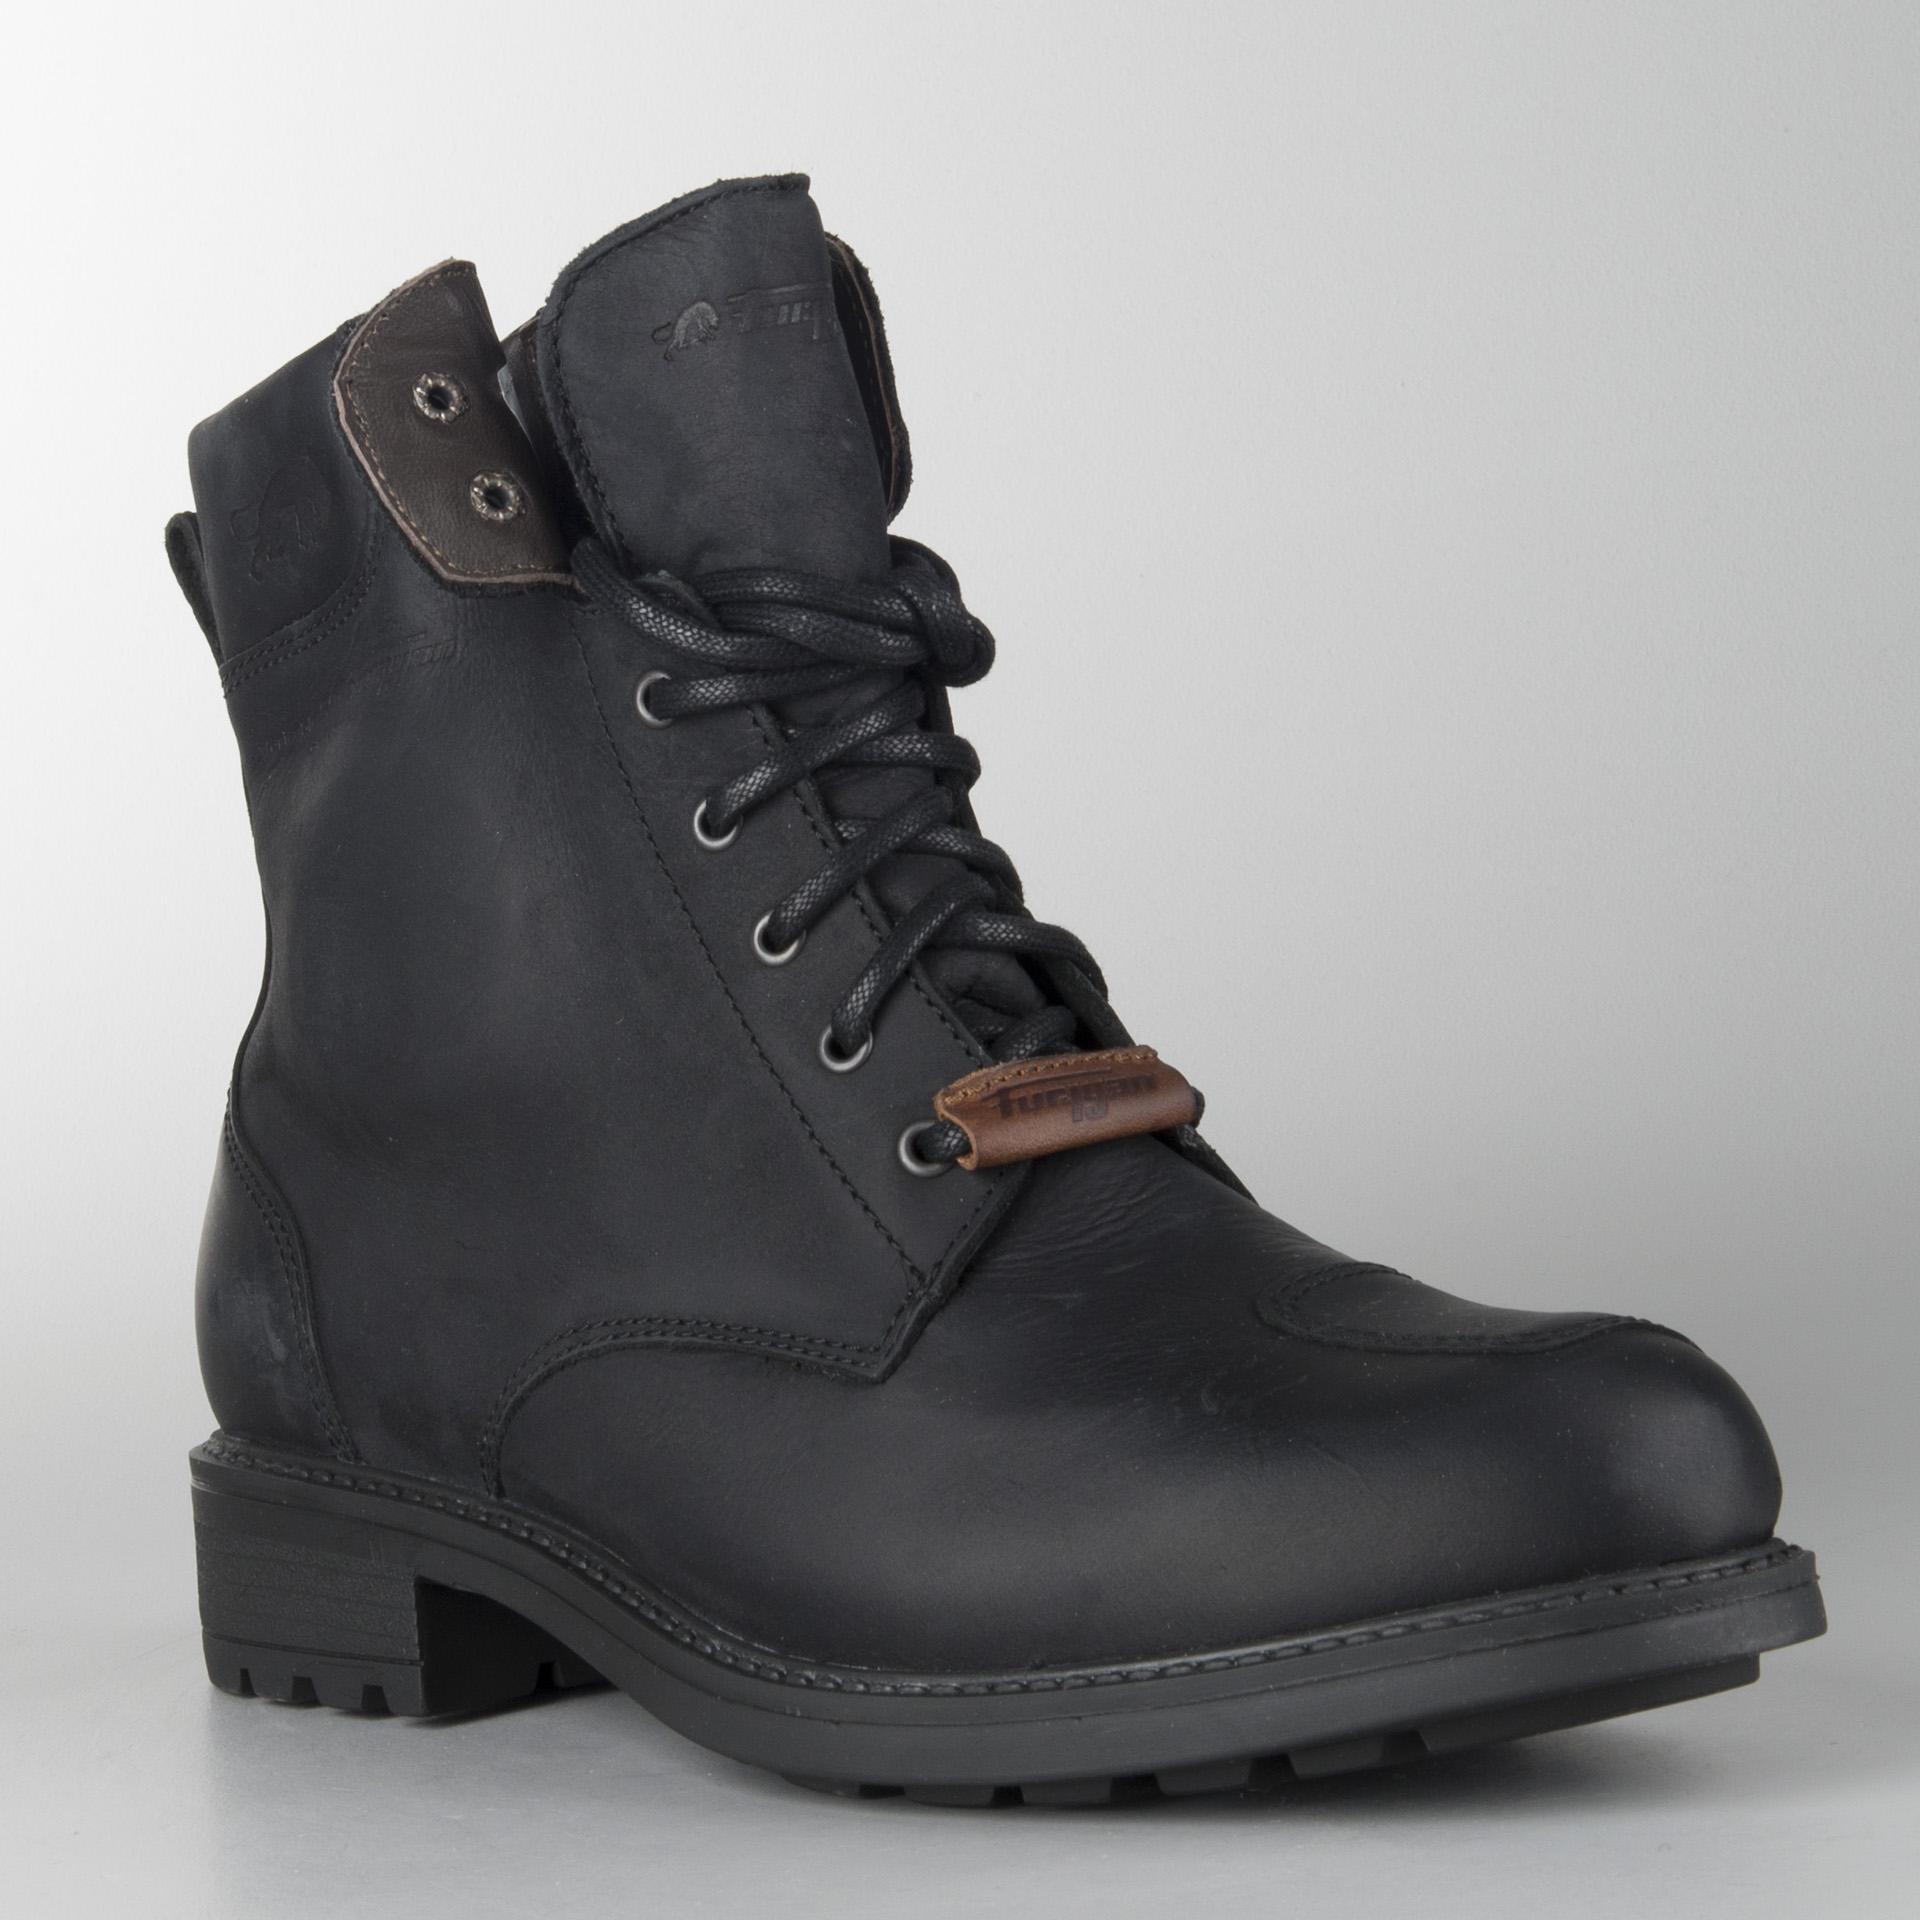 Furygan Caprino D3O Sympatex Size 45 Black